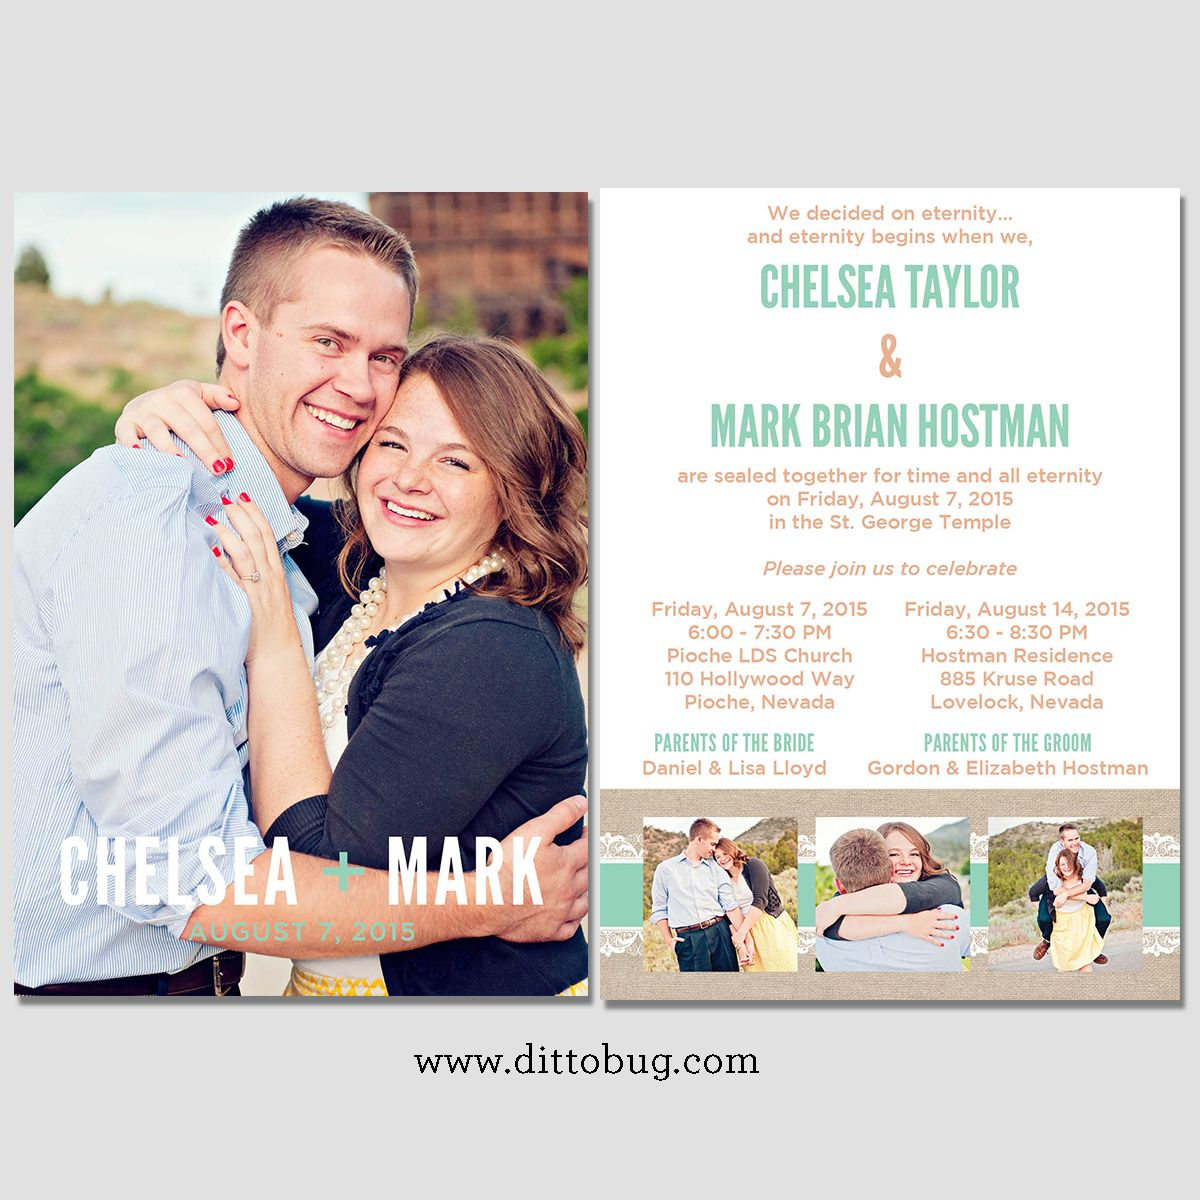 utah wedding invitations and utah wedding announcements - Wedding Invitations Utah